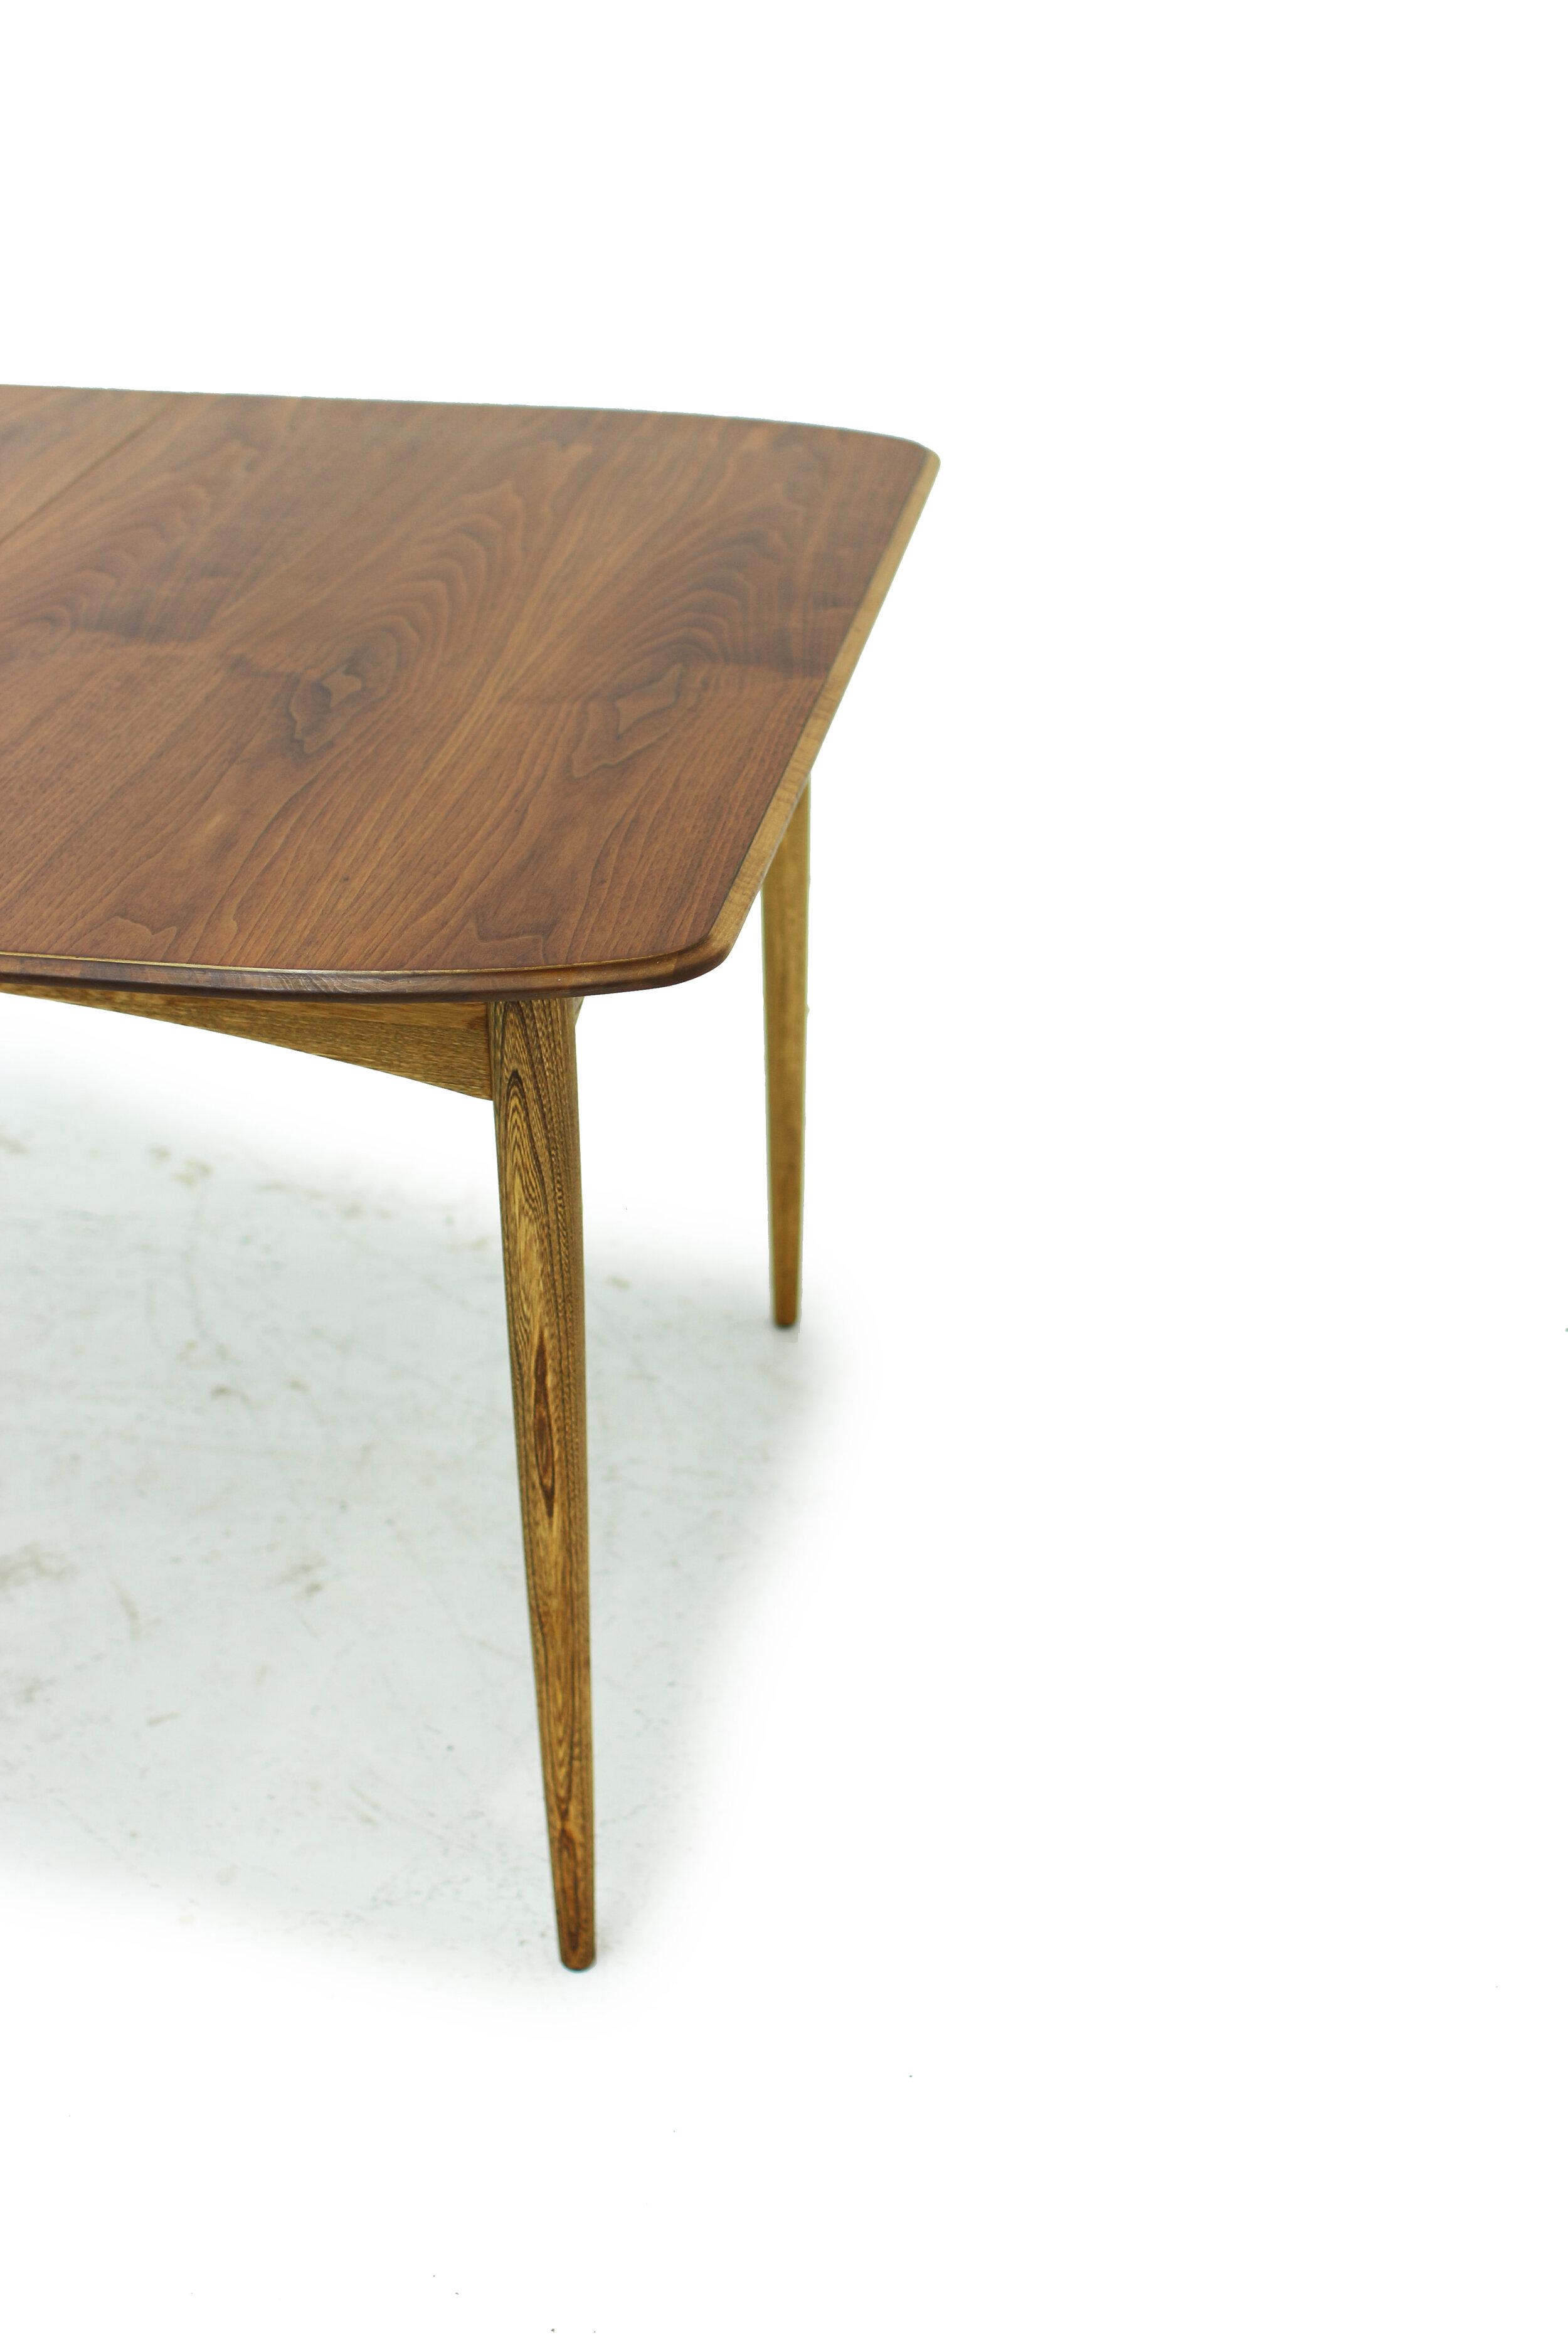 Mid Century Walnut and Ash Dining Table (3).jpg